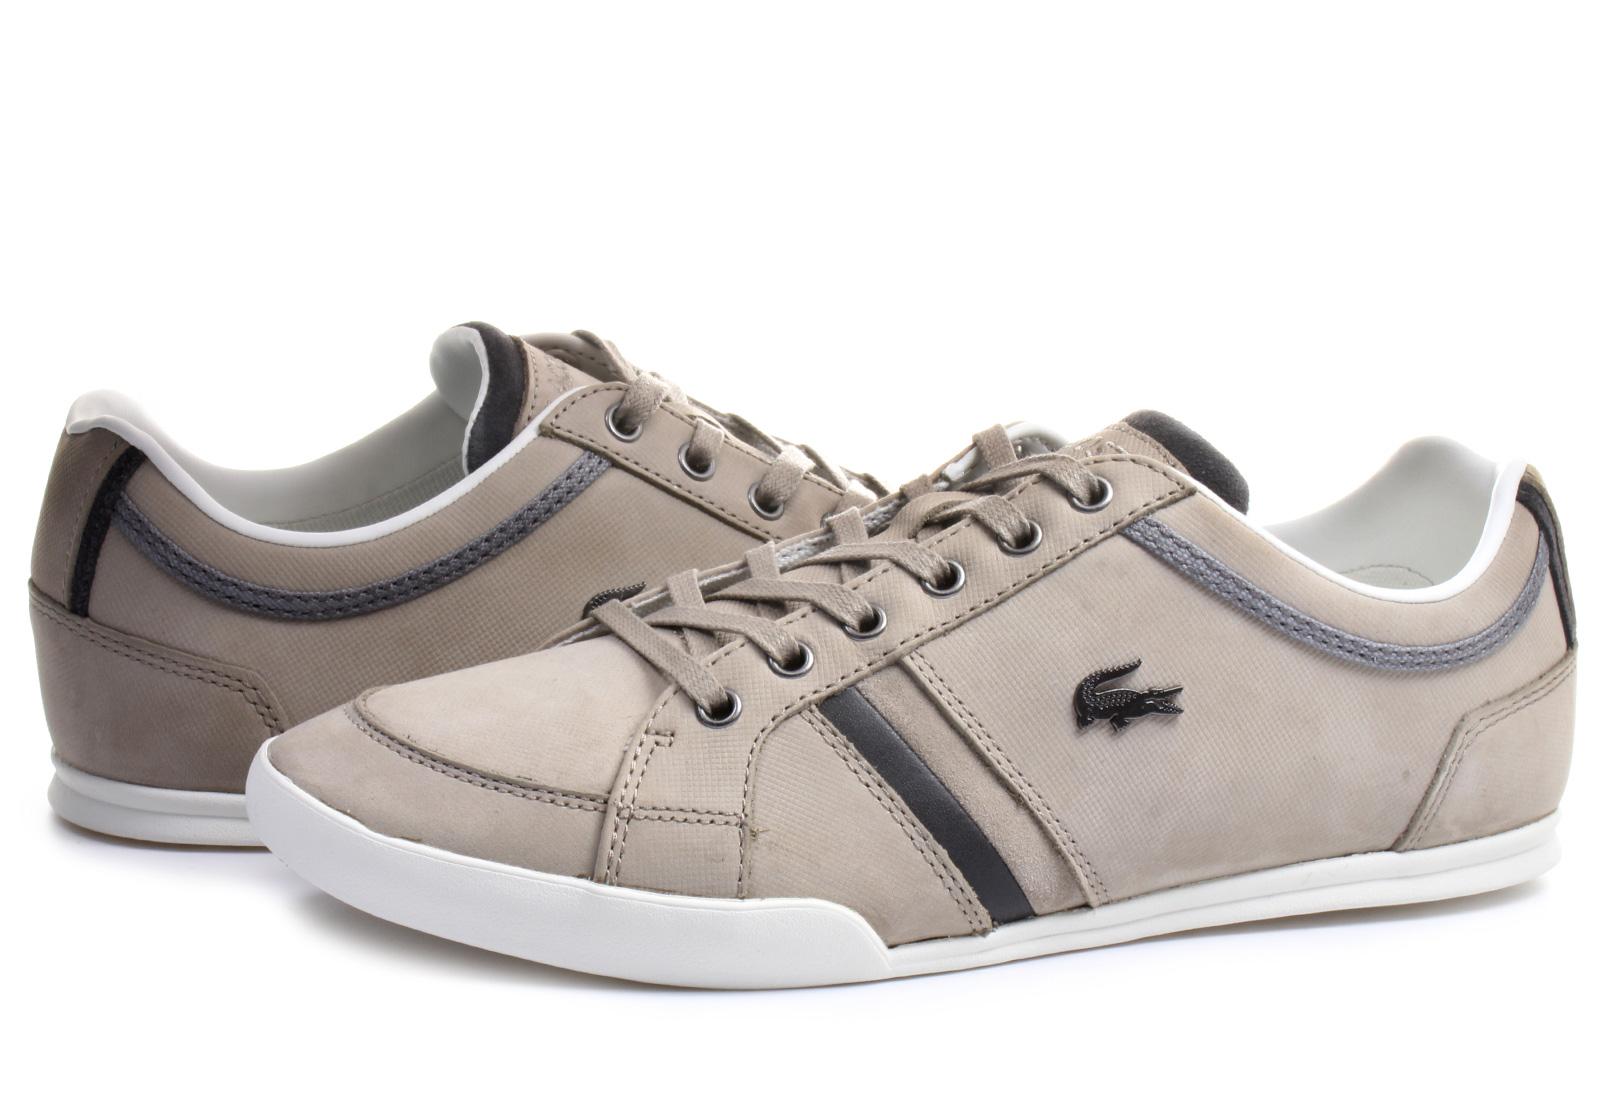 d35f005be50 Lacoste Shoes - Rayford - 141srm1230-158 - Online shop for ...